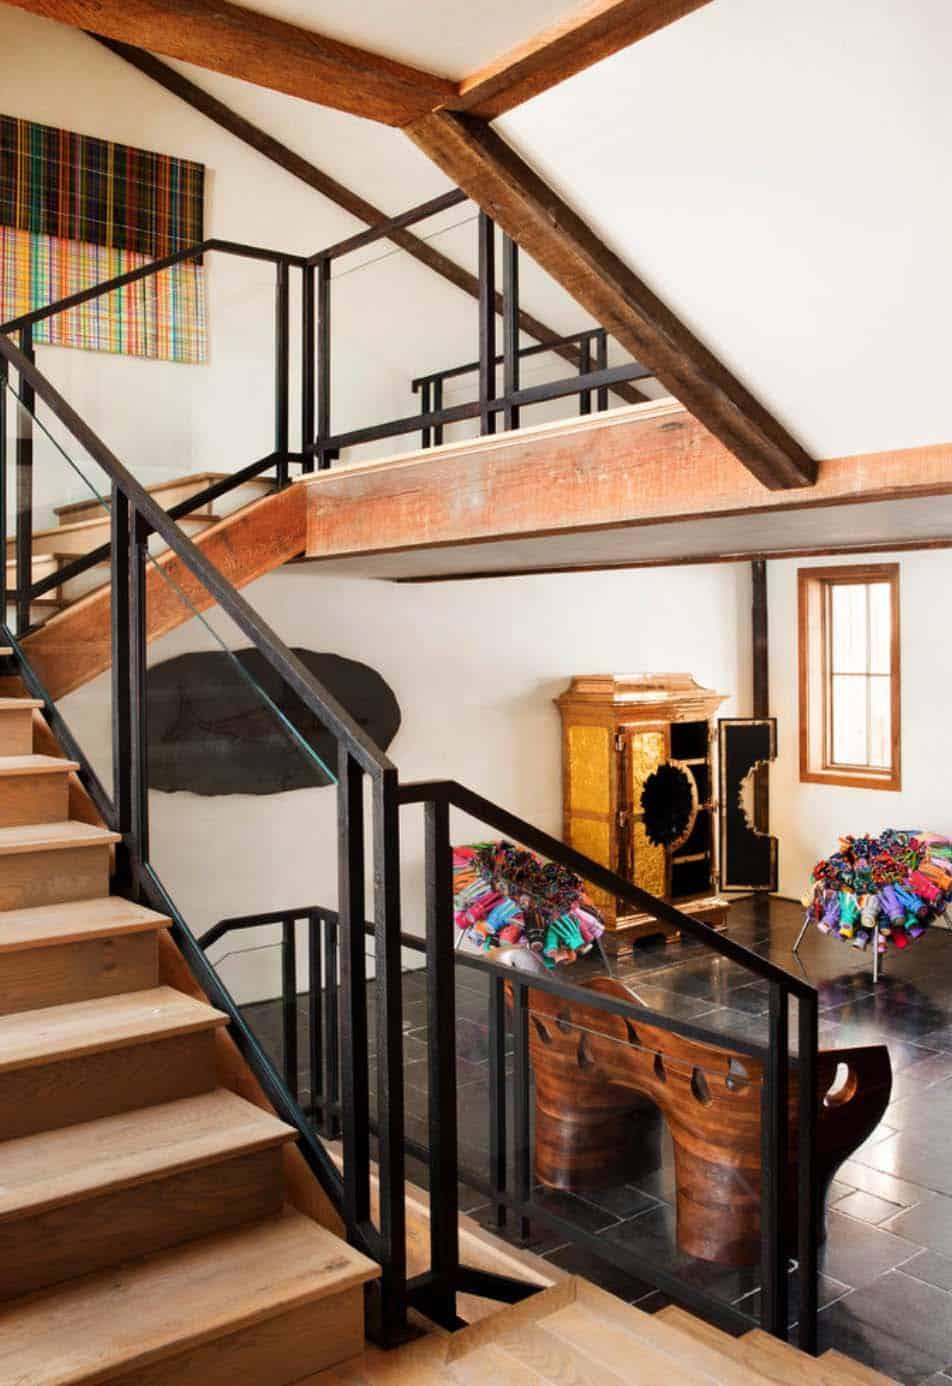 Modern Rustic Mountain Retreat-Frank de Biasi Interiors-12-1 Kindesign